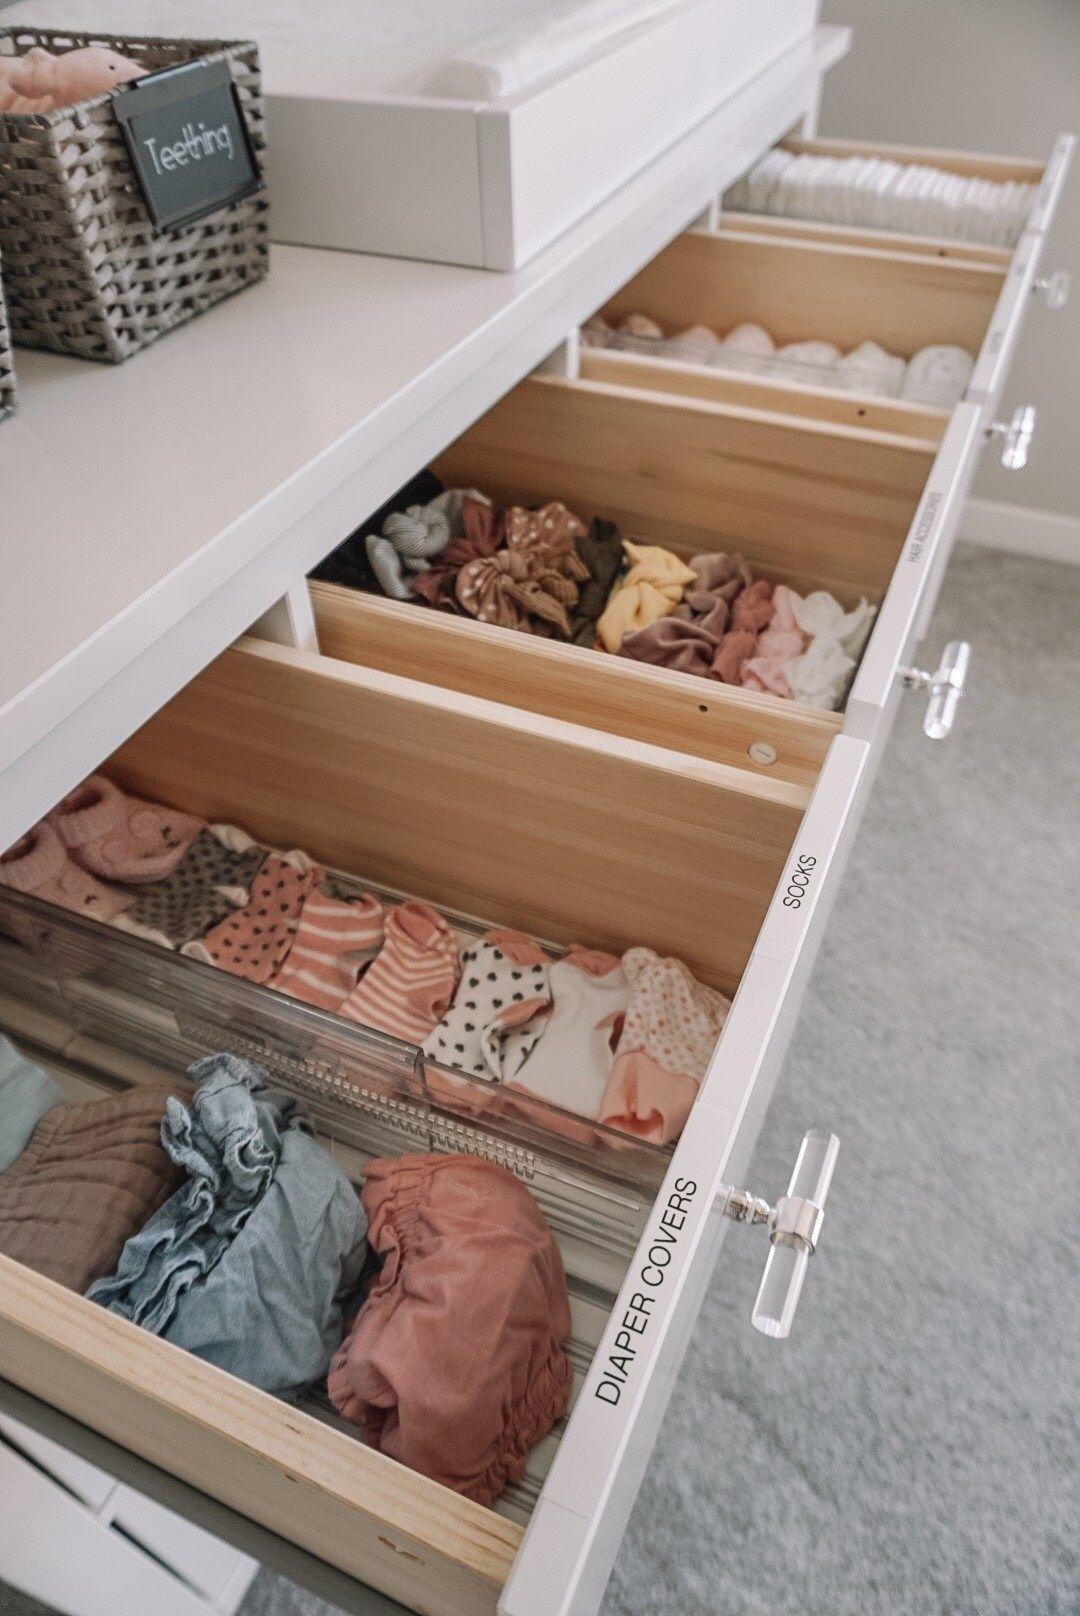 baby stuff #baby Blairs Closet and Organization Reveal Karlie Rae Lang